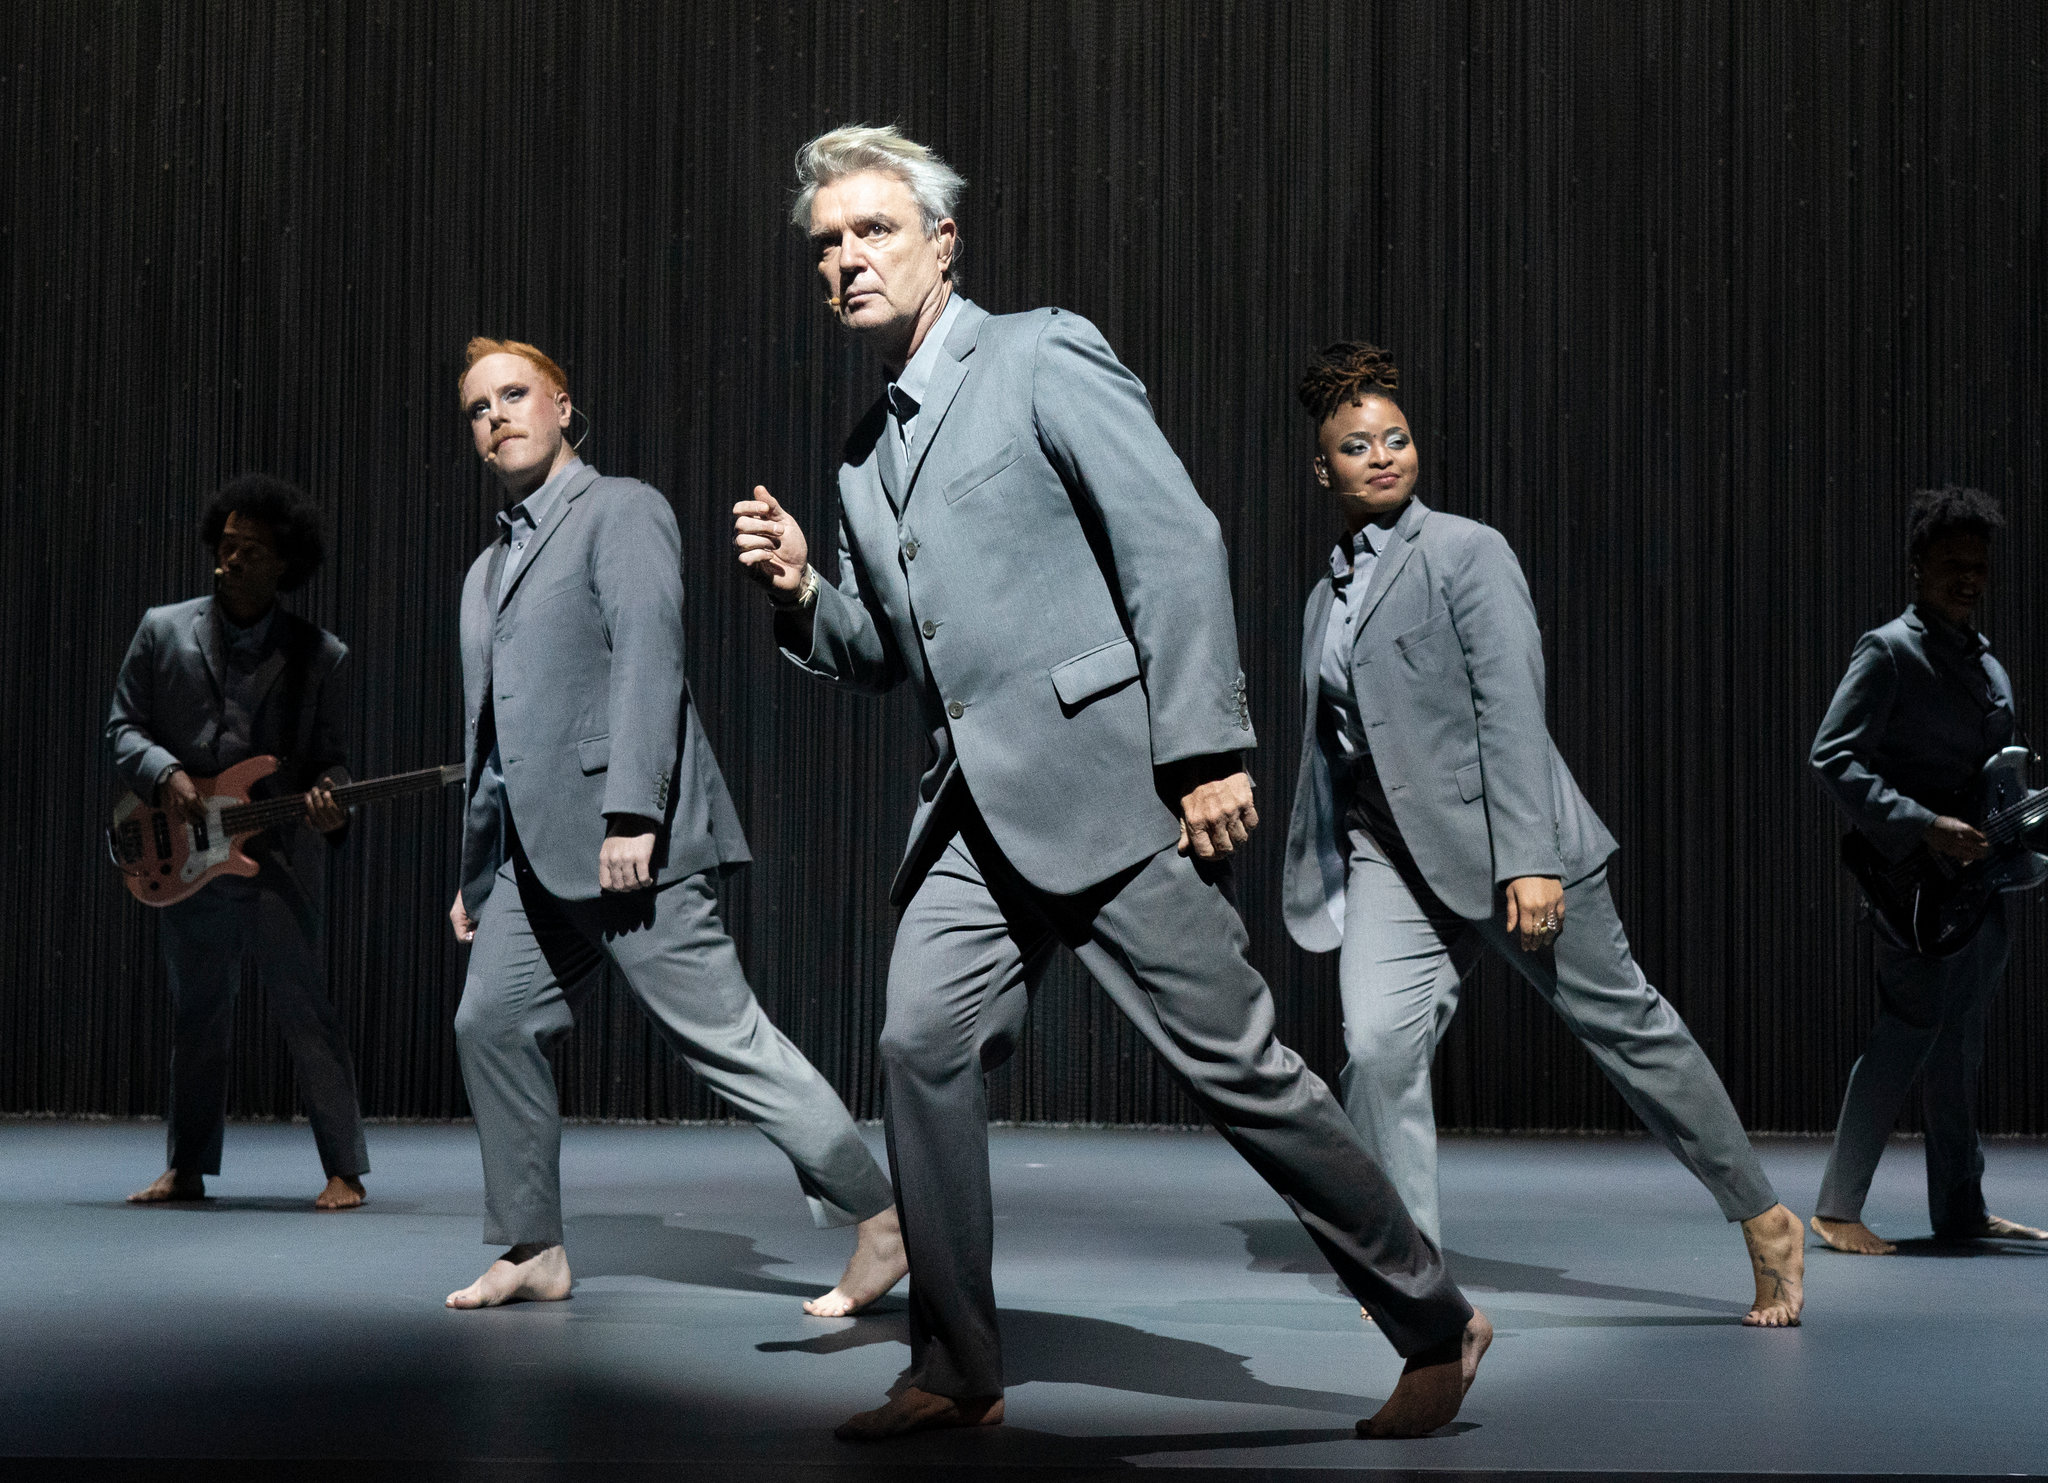 David Byrne's American Utopia directed by Spike Lee